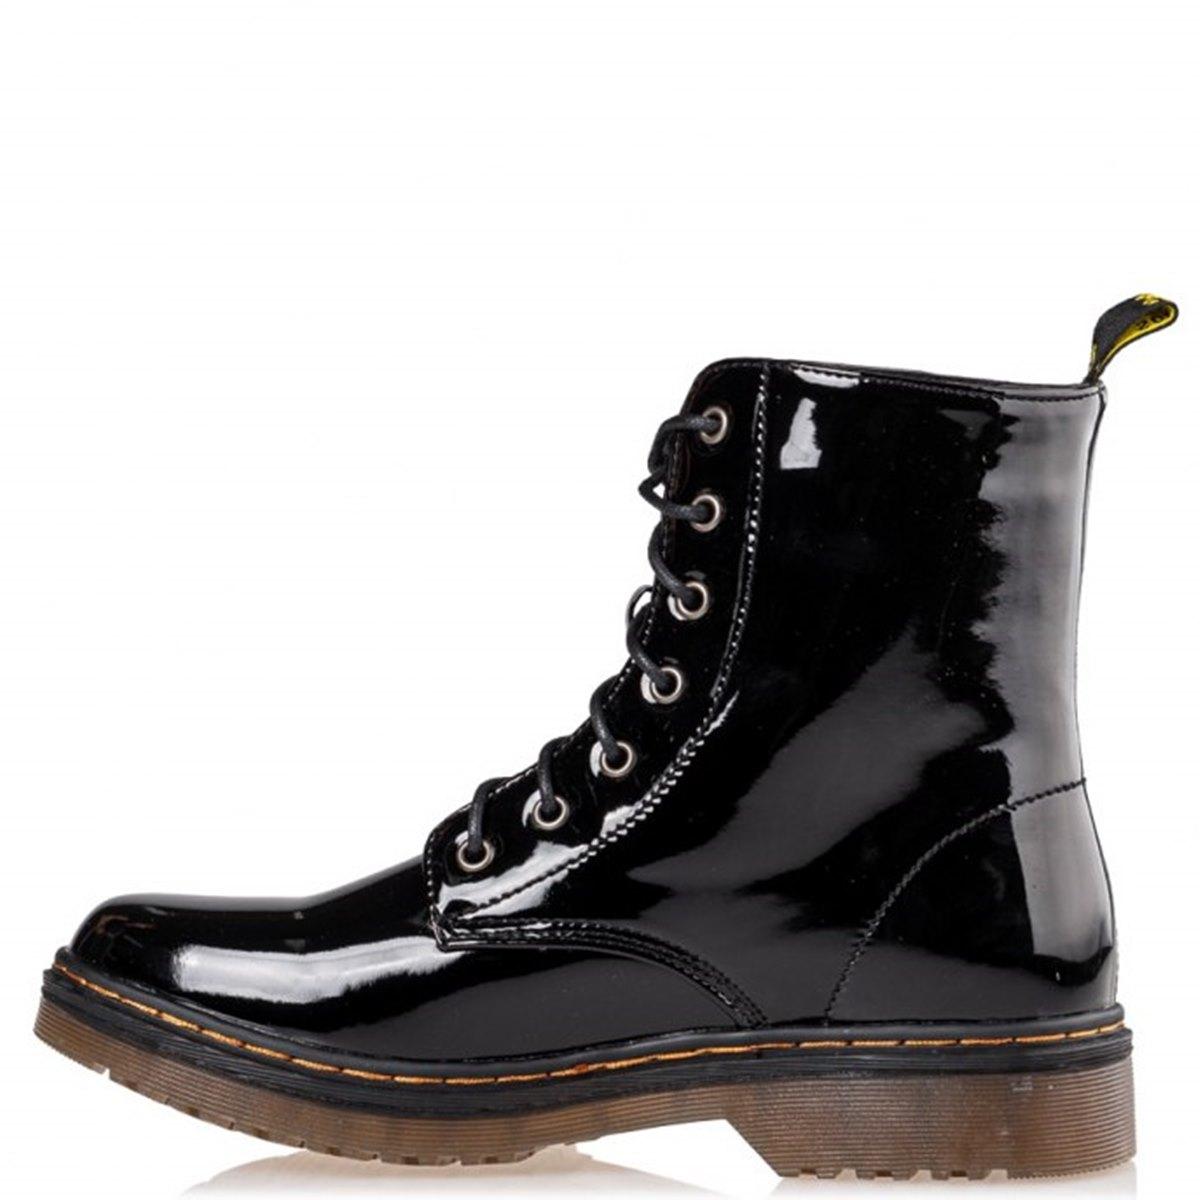 COMBAT BOOTIES Miss NV αρβυλάκια φλάτ V15-12954 black βερνί